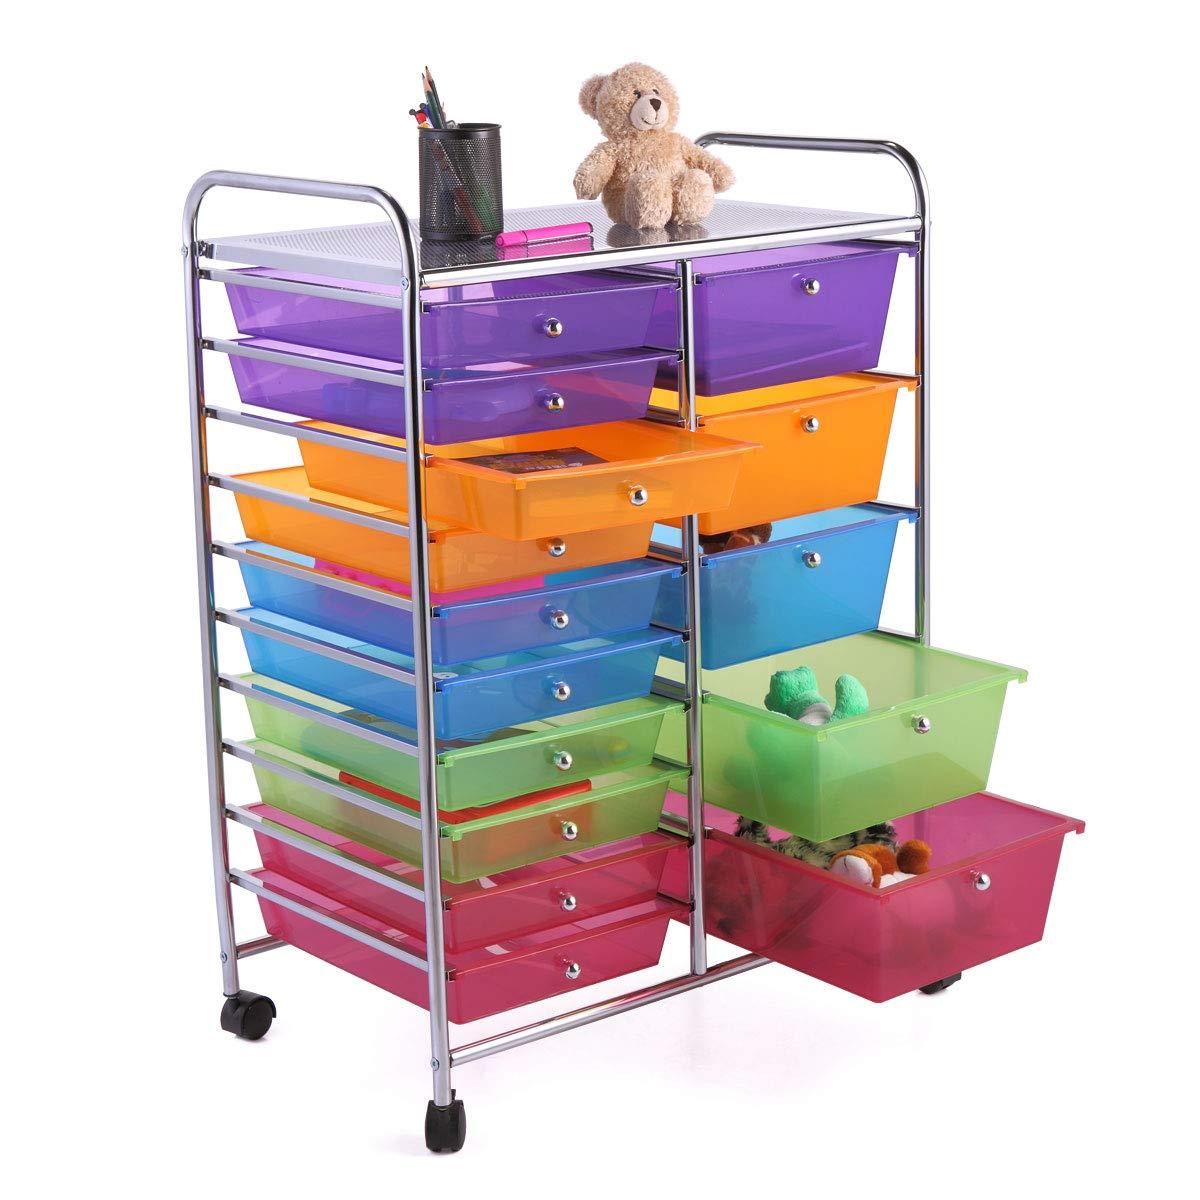 JAXPETY Rolling Storage Cart w/15 Drawers Metal Rack Kids Shelf Home Office School Salon by JAXPETY